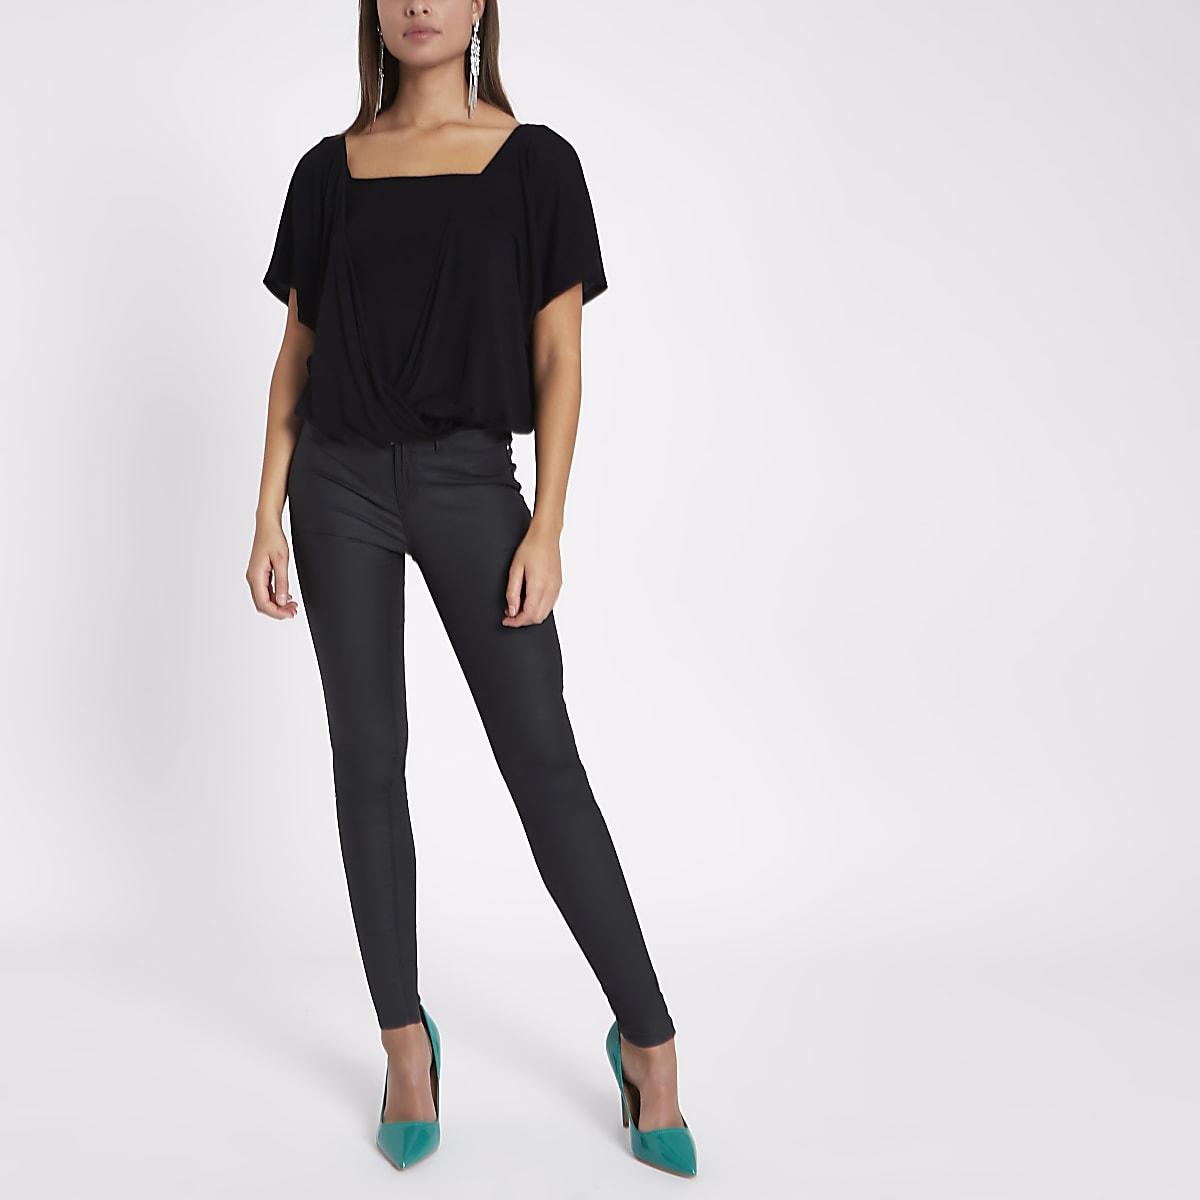 Black double layer batwing bodysuit